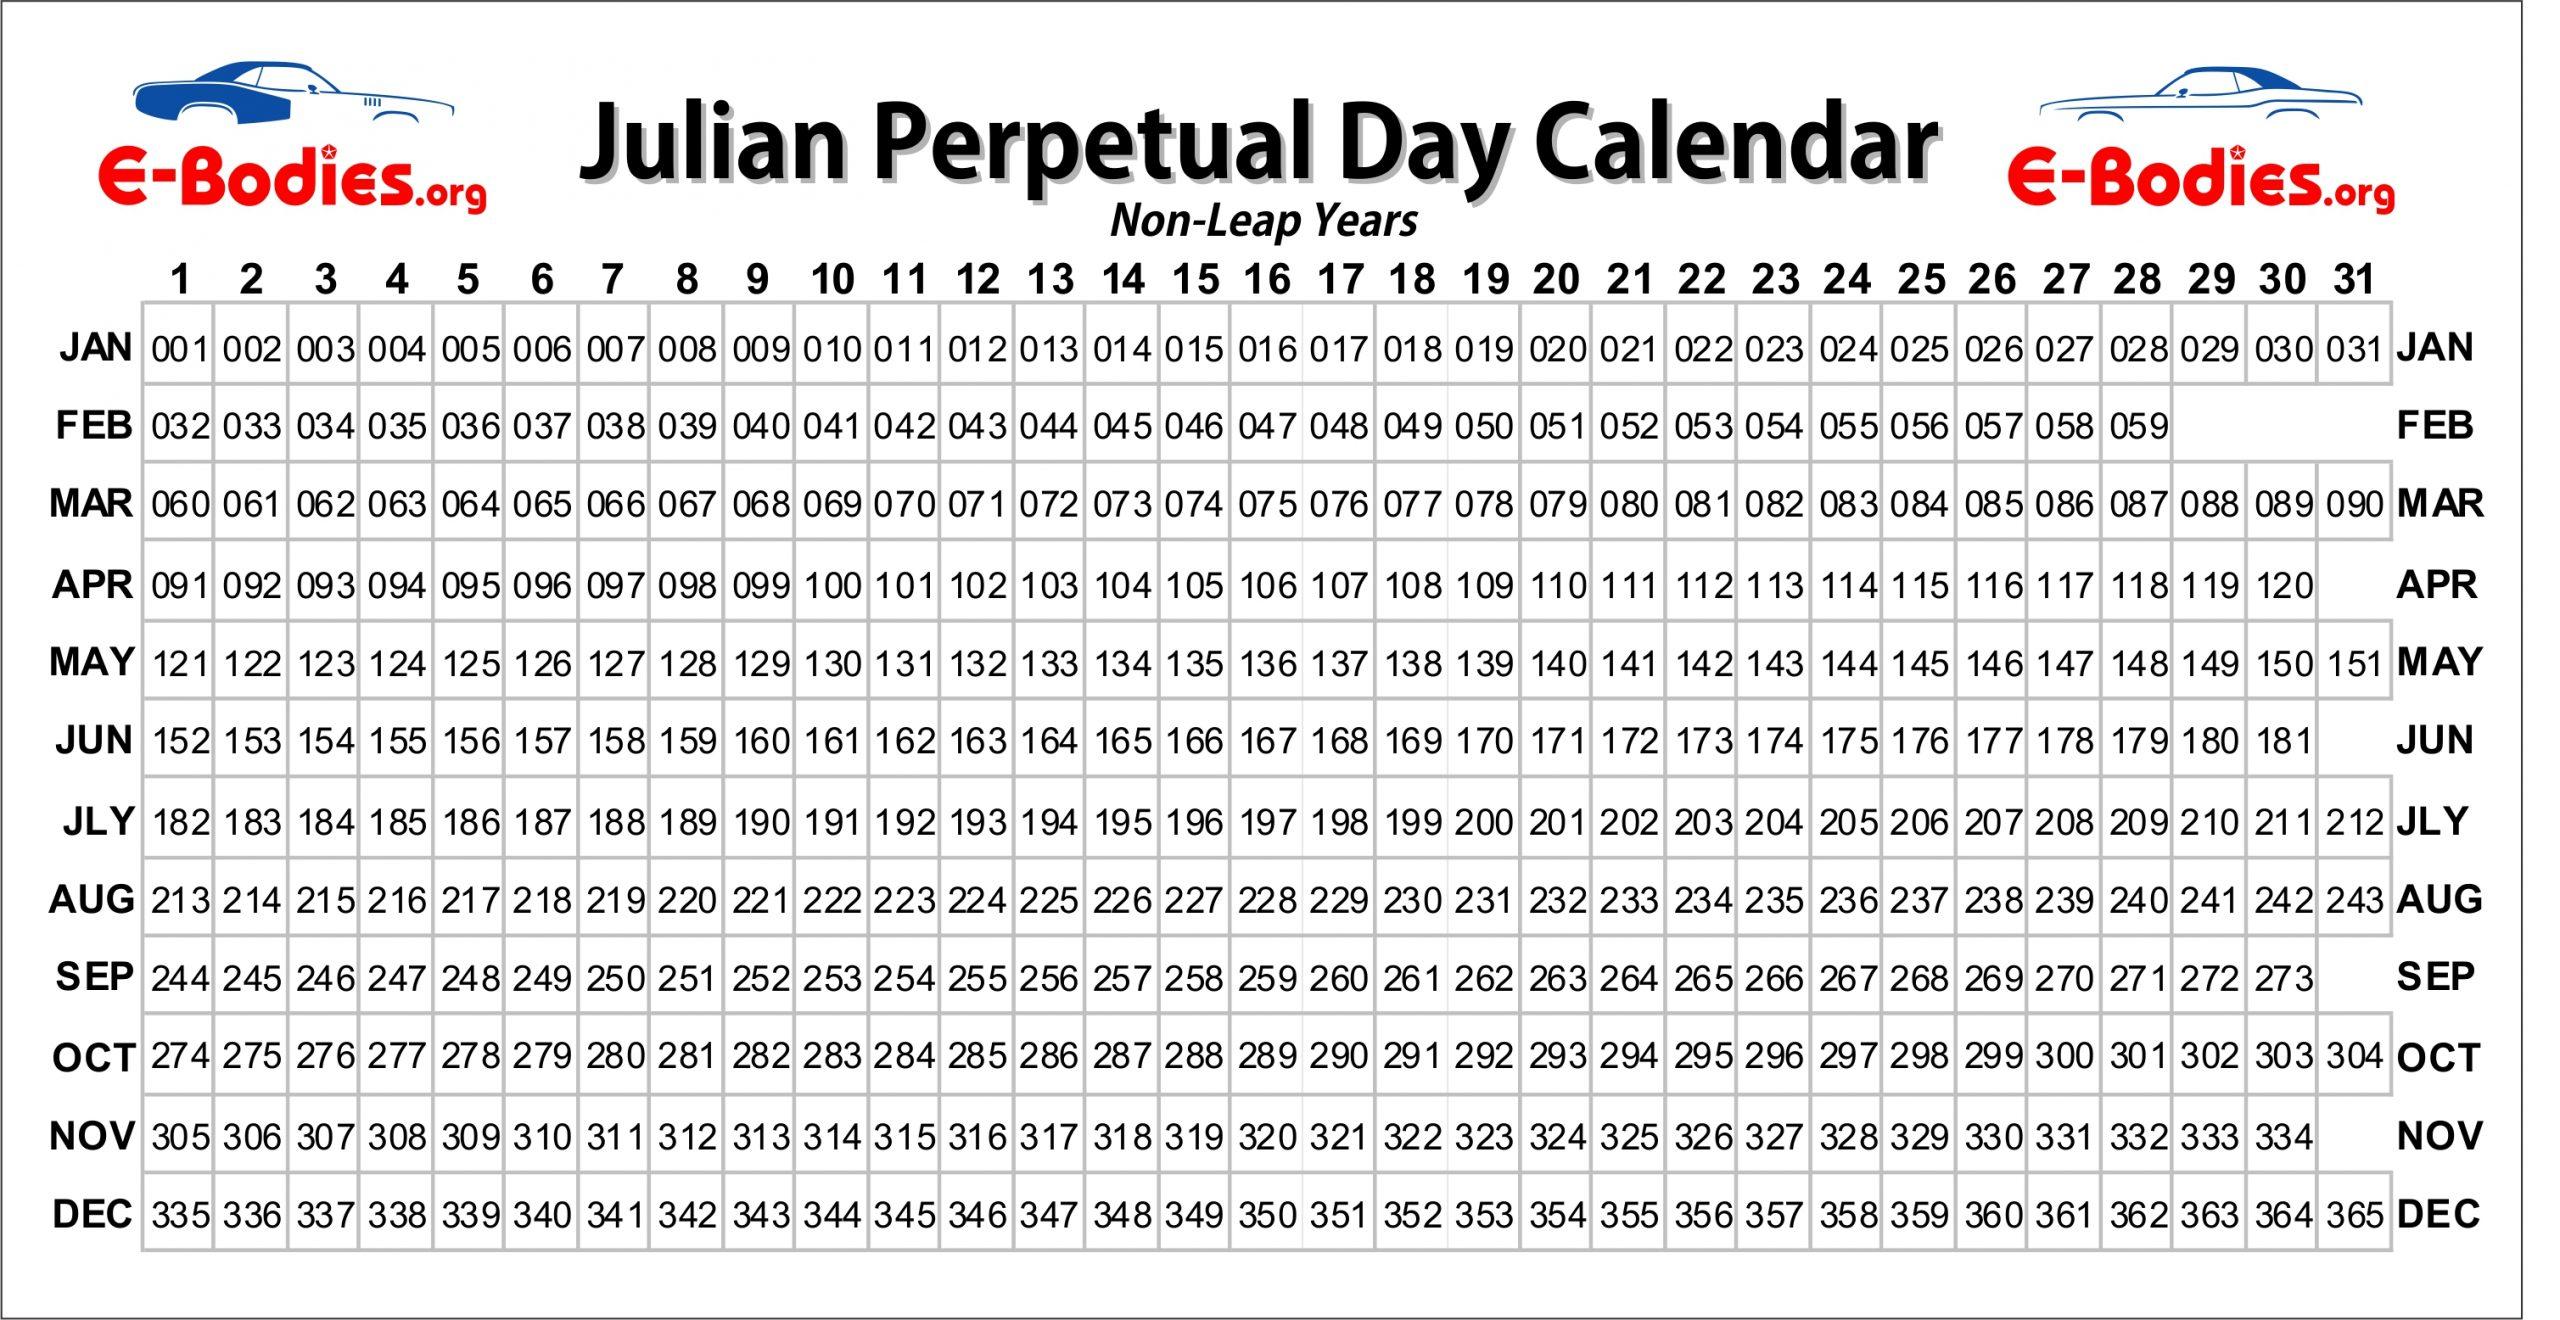 Mopar Julian Perpetual Day Calendar - E Bodies In Julian Date To Calander Date